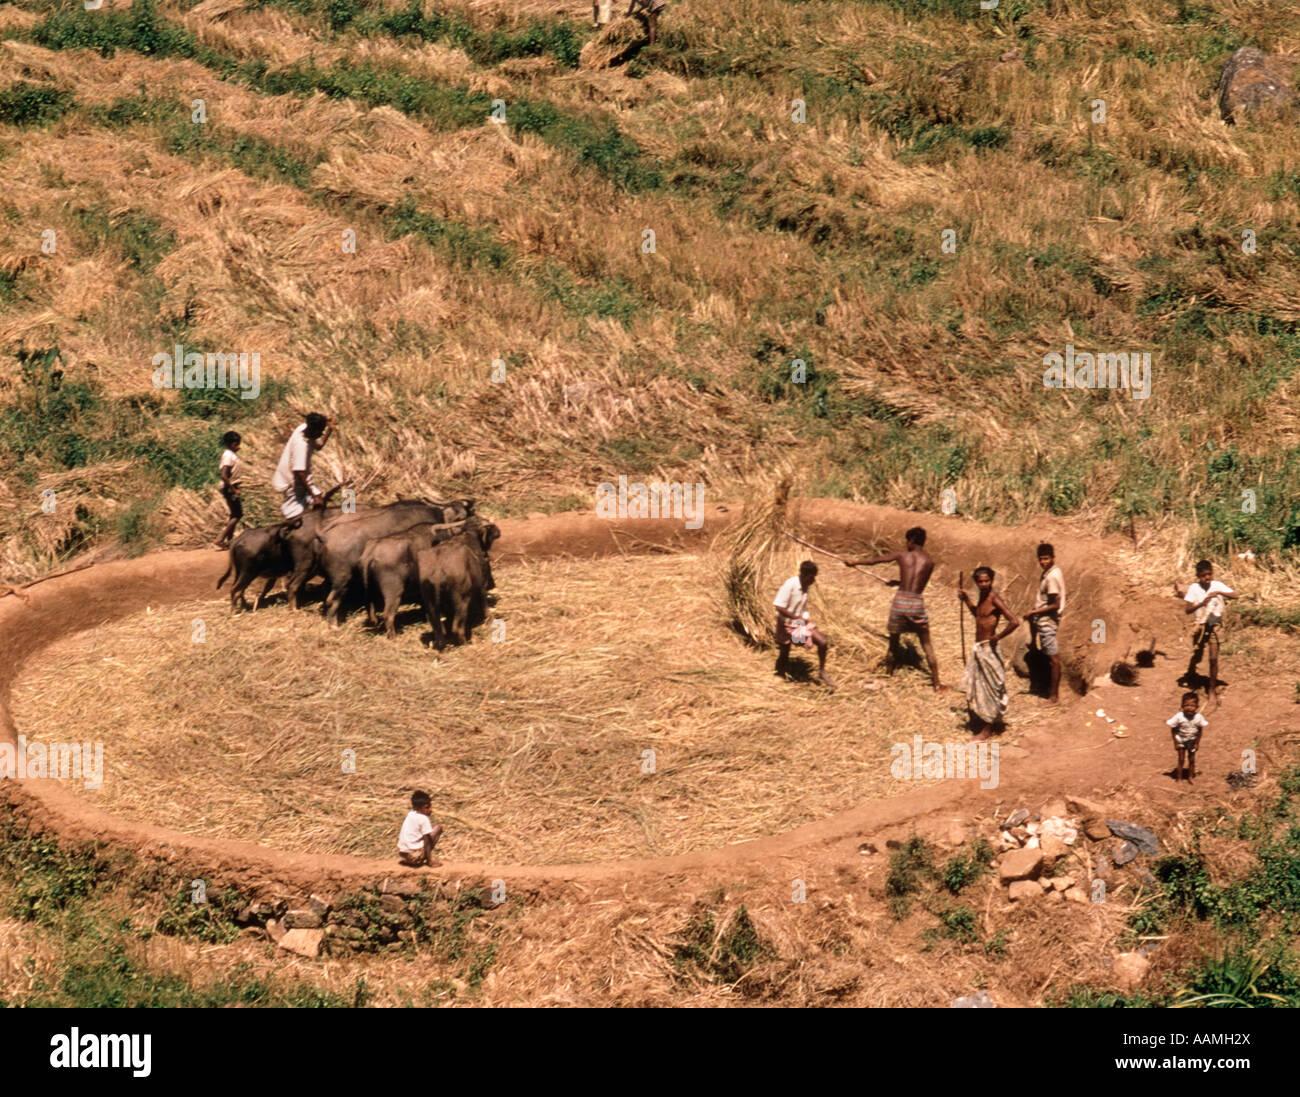 RETRO CEYLON PRIMITIVE RICE THRASHING TRAMPLING ANIMALS - Stock Image